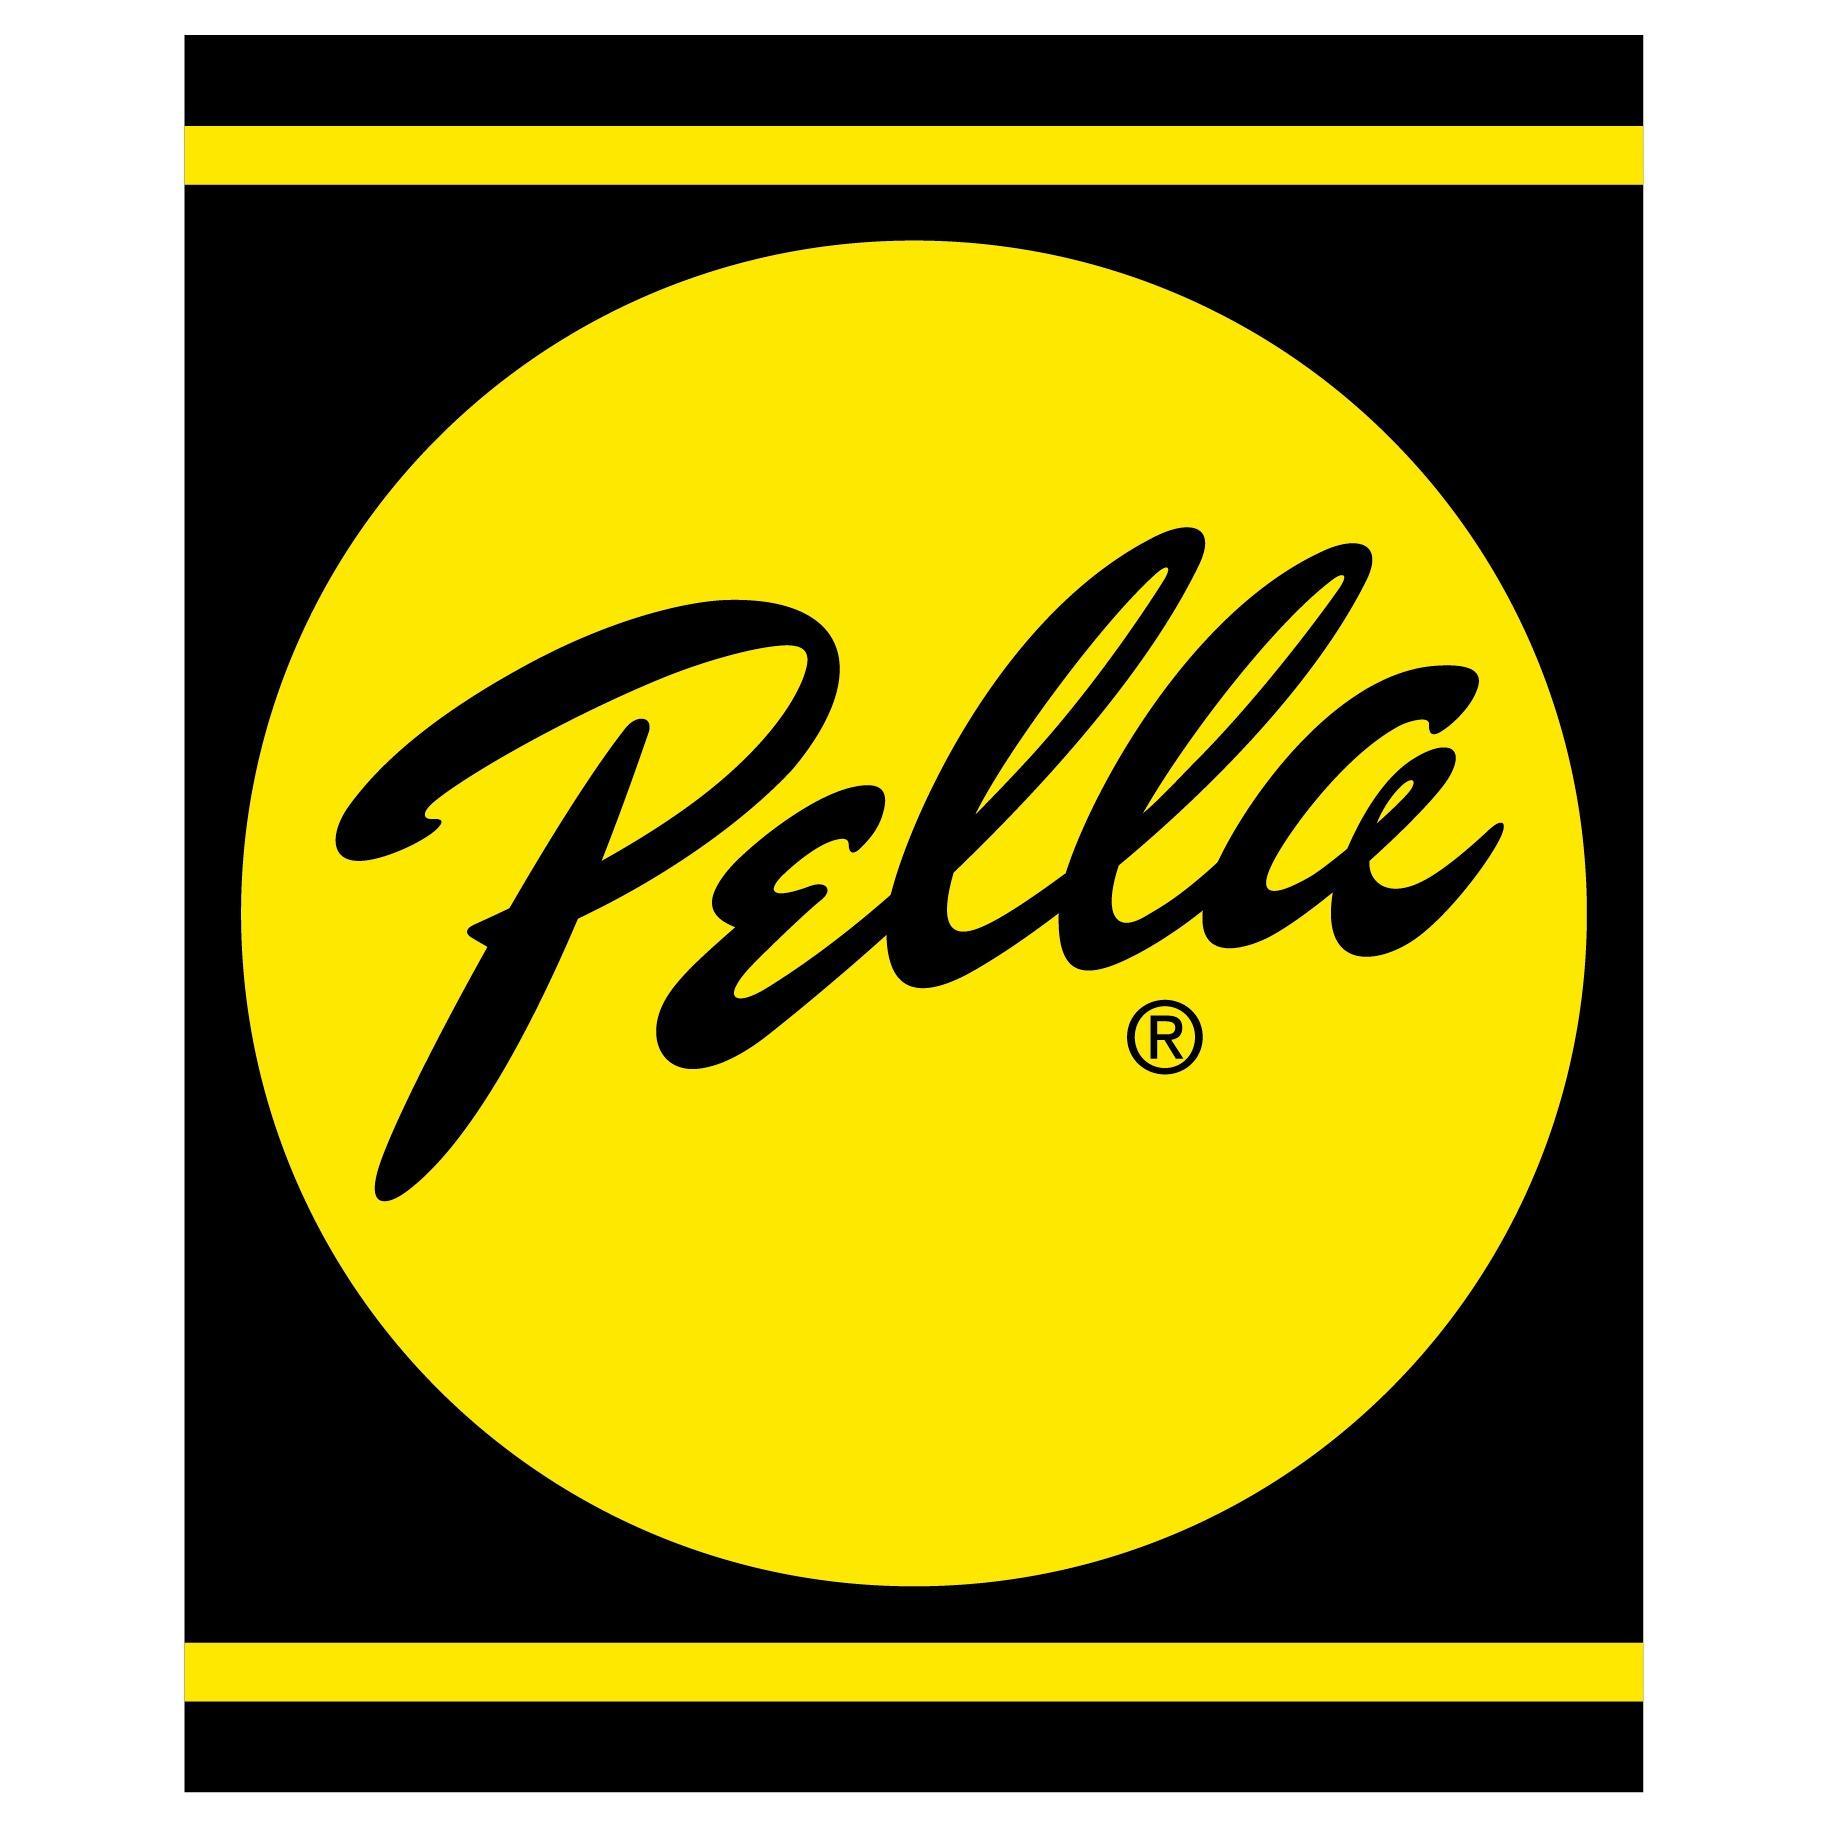 Pella Windows and Doors of Shrewsbury